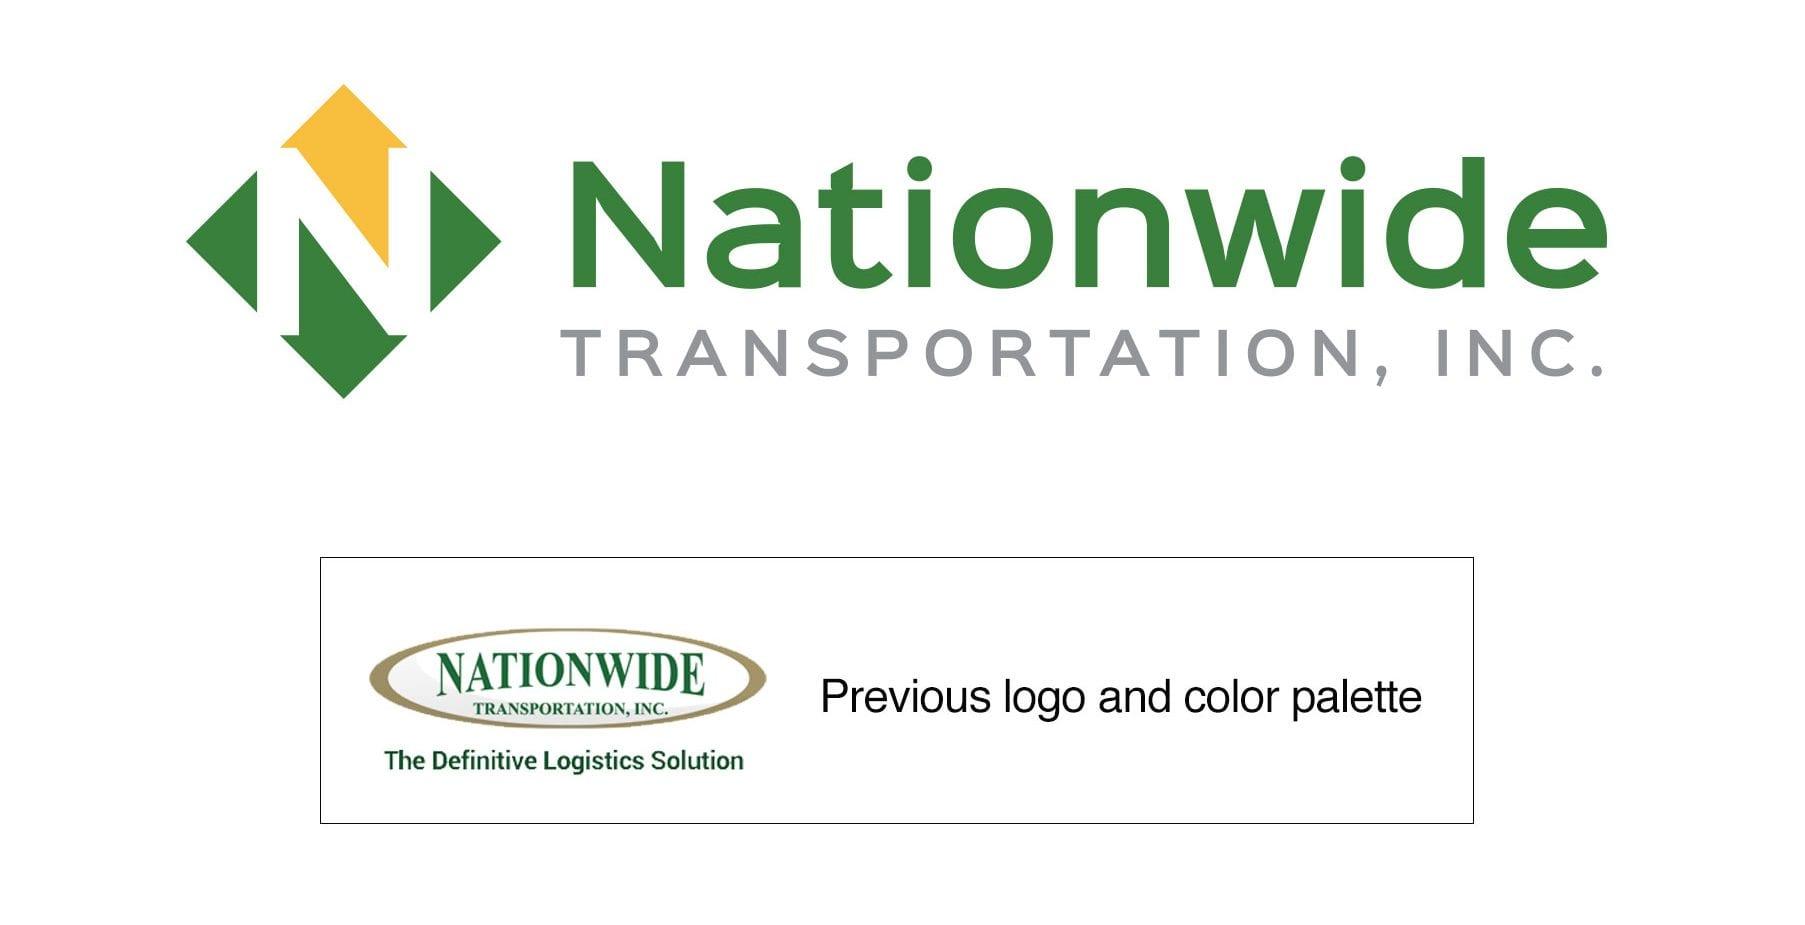 Nationwide Transportation